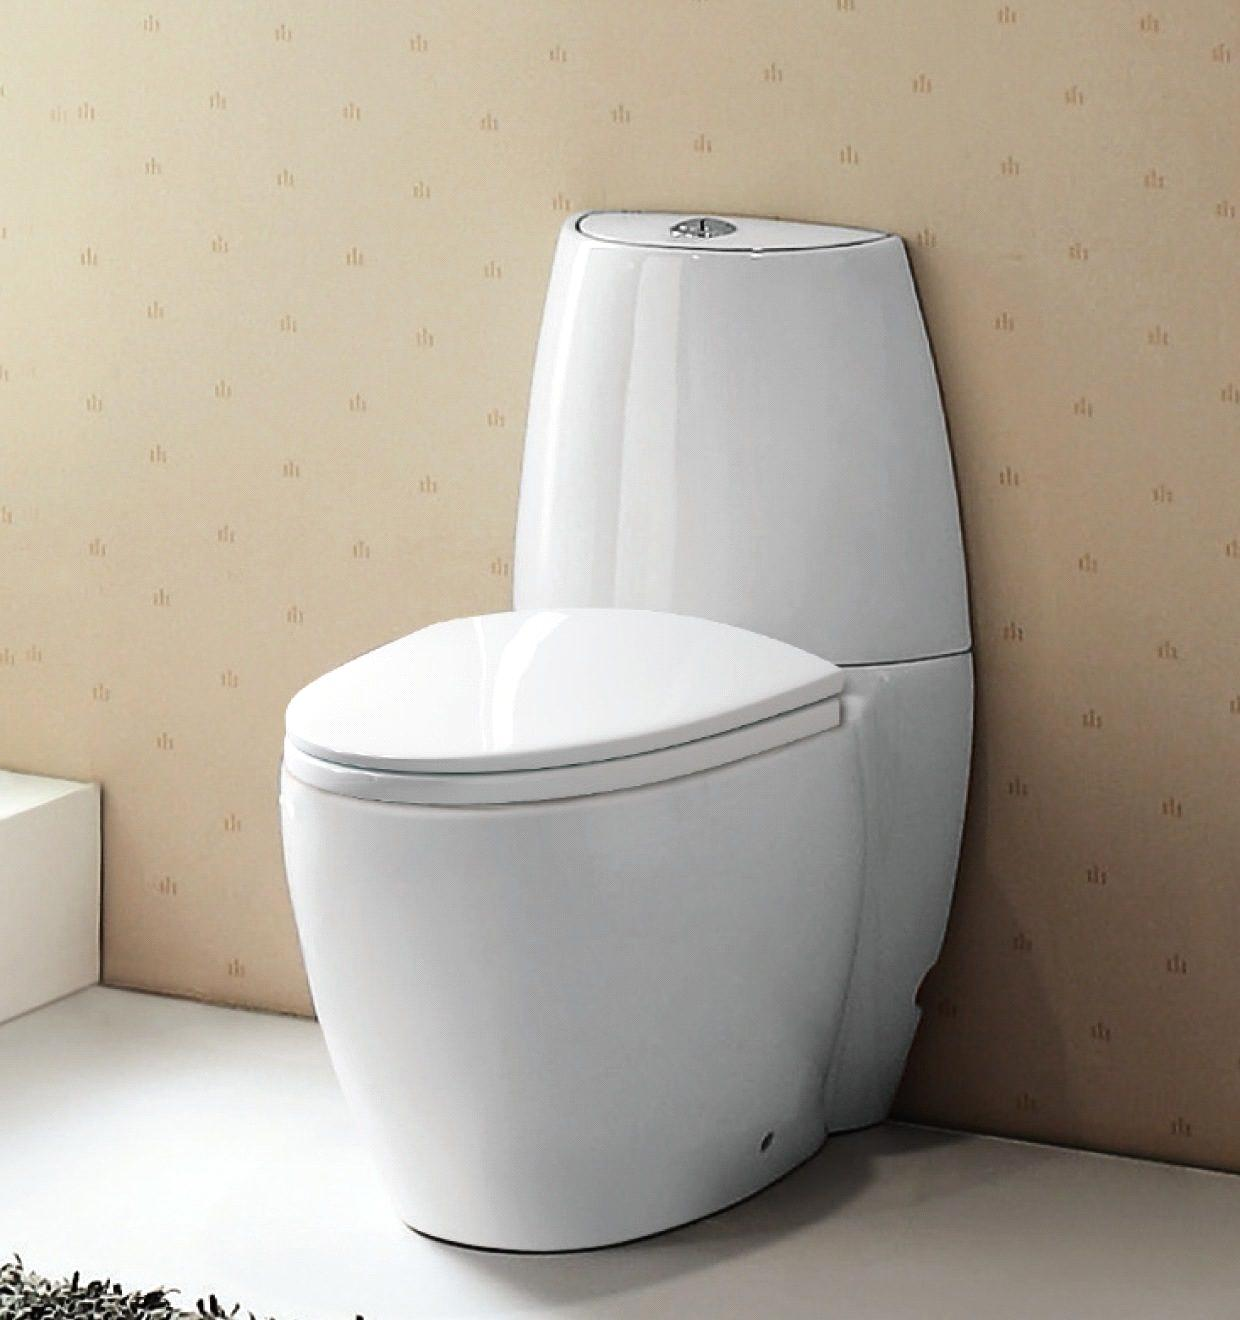 Awesome Replace Bathroom Fan Light Bulb Tall Lowe S Canada Bathroom Cabinets Round Bathtub Grout Repair Total Bathroom Remodel Old Remodel Bathroom Vanity Top PinkBest Bathroom Designs 2013 Bathroom Water Closet Design   Rukinet